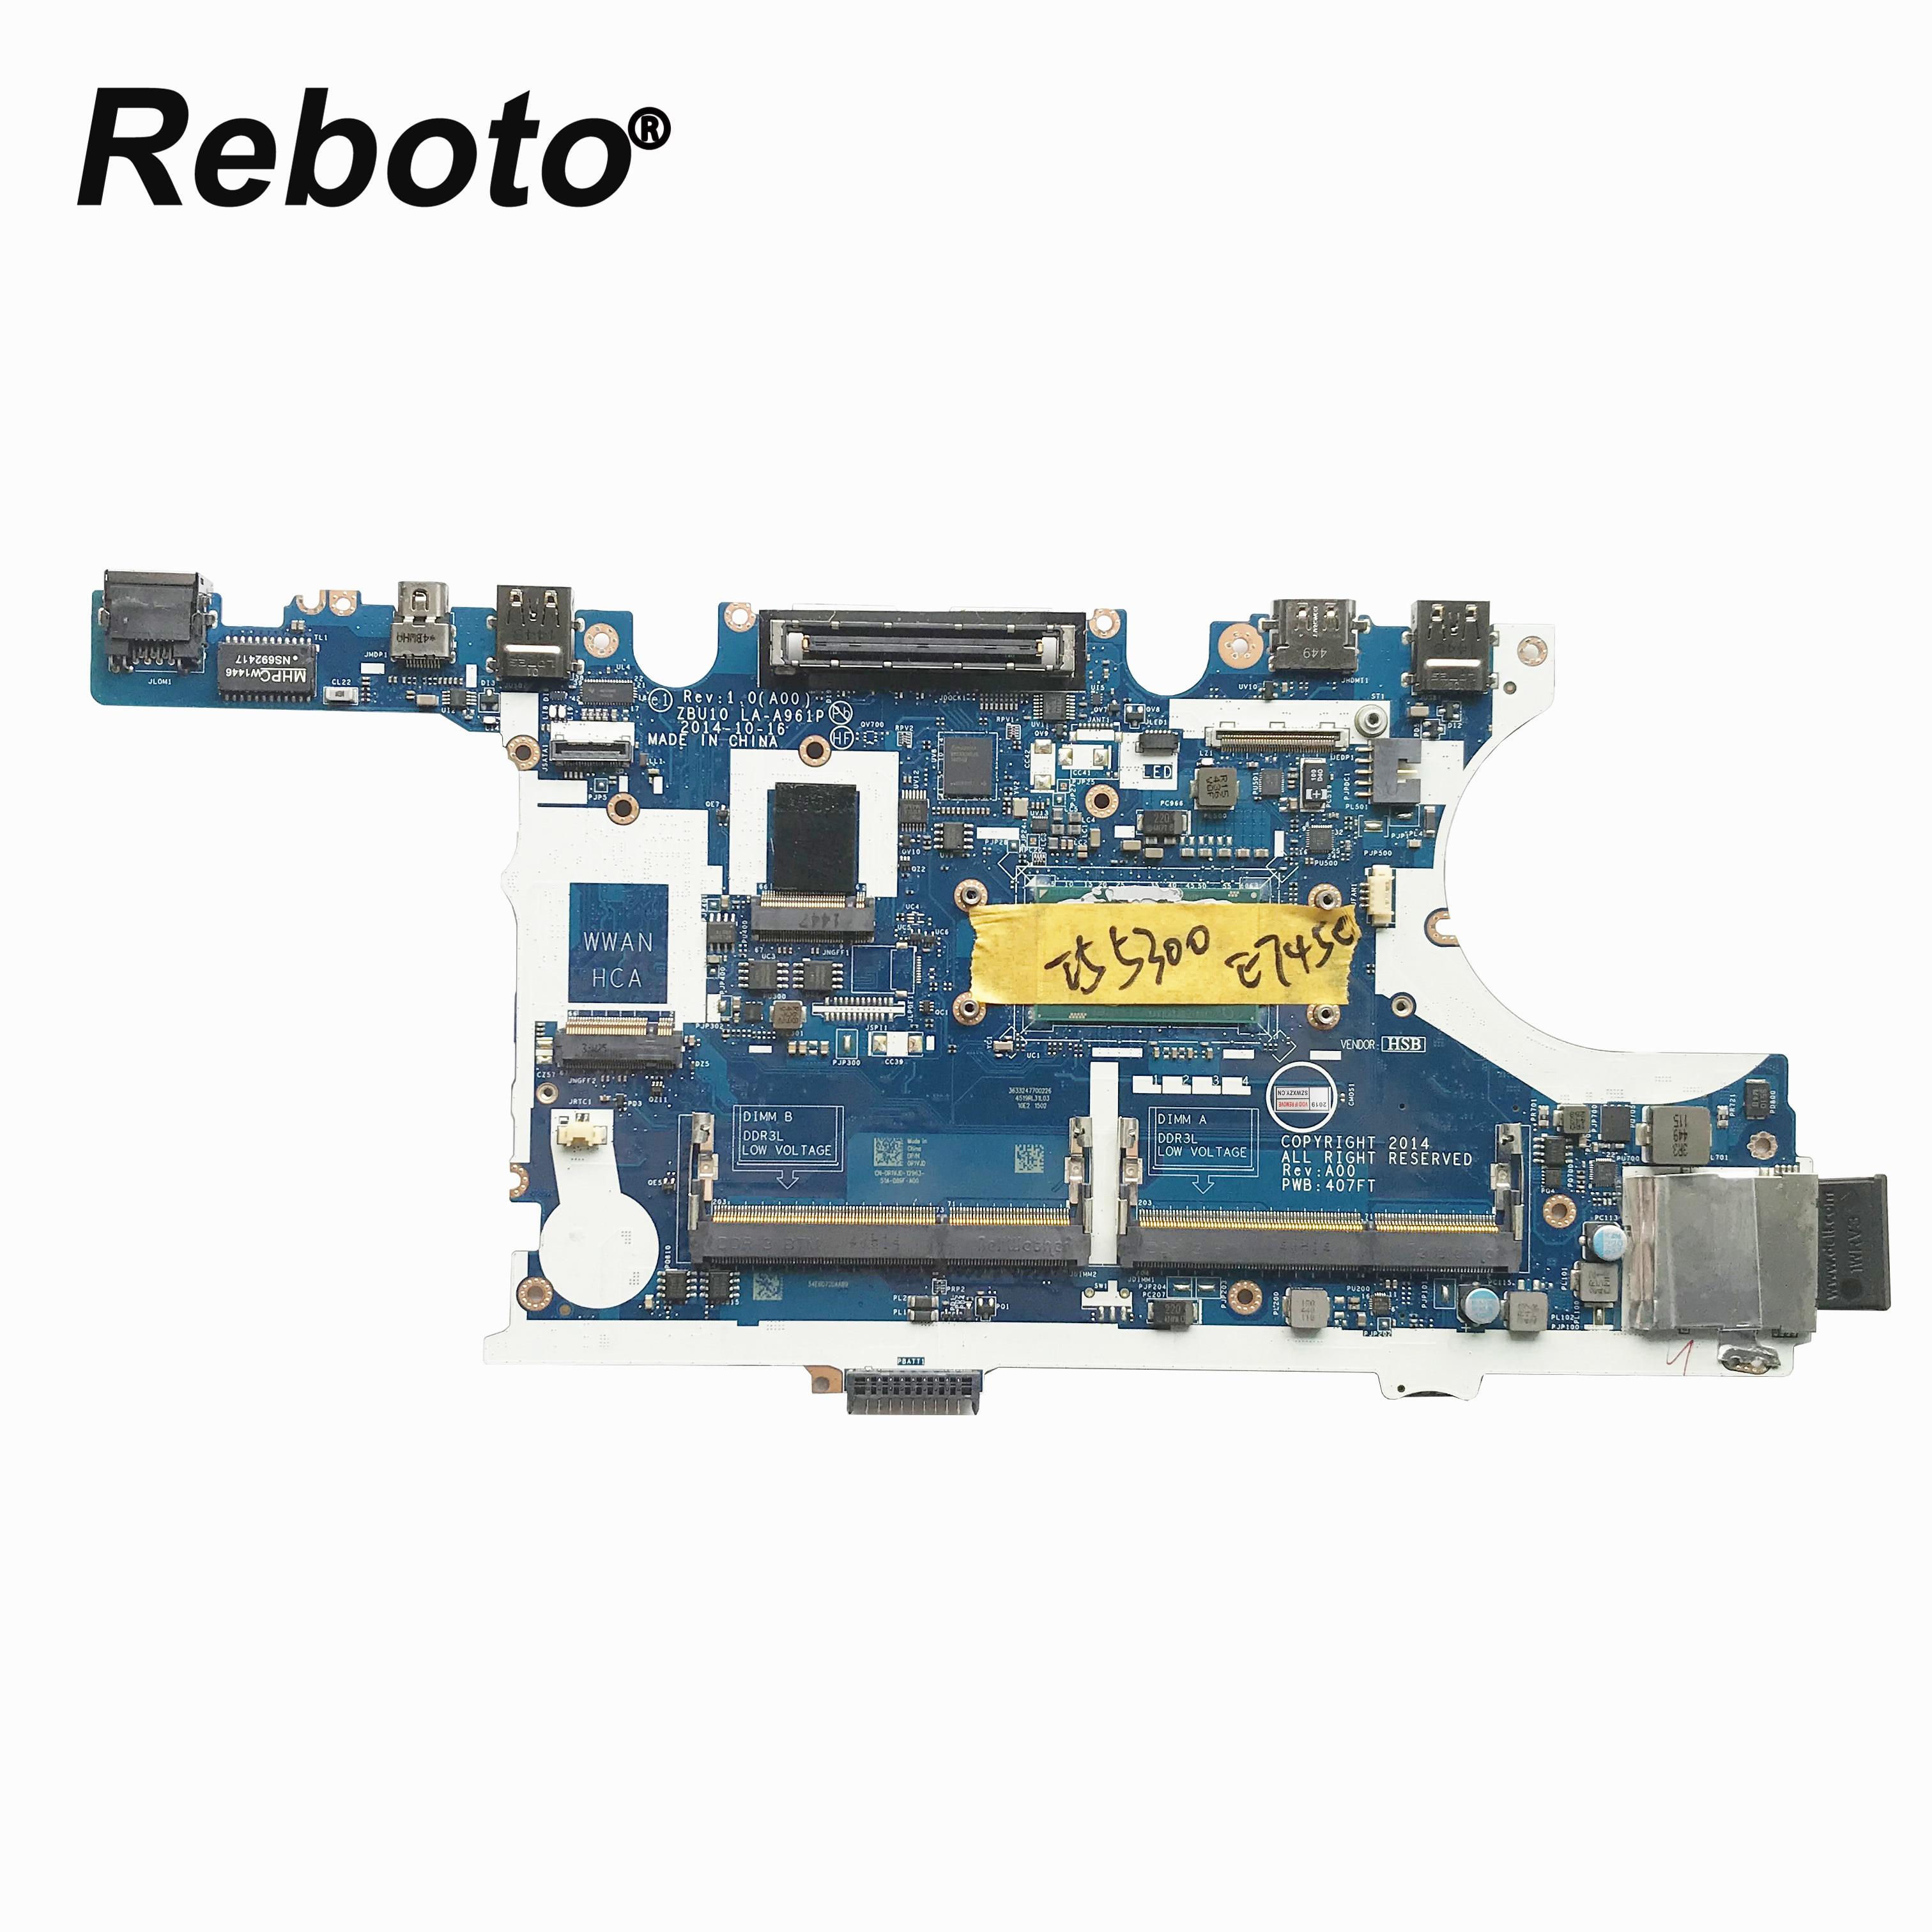 Оригинальная материнская плата для ноутбука DELL Latitude E7450 CN-0R1VJD 0R1VJD R1VJD ZBU10 LA-A961P с I5-5300U процессором DDR3L MB 100% протестирована